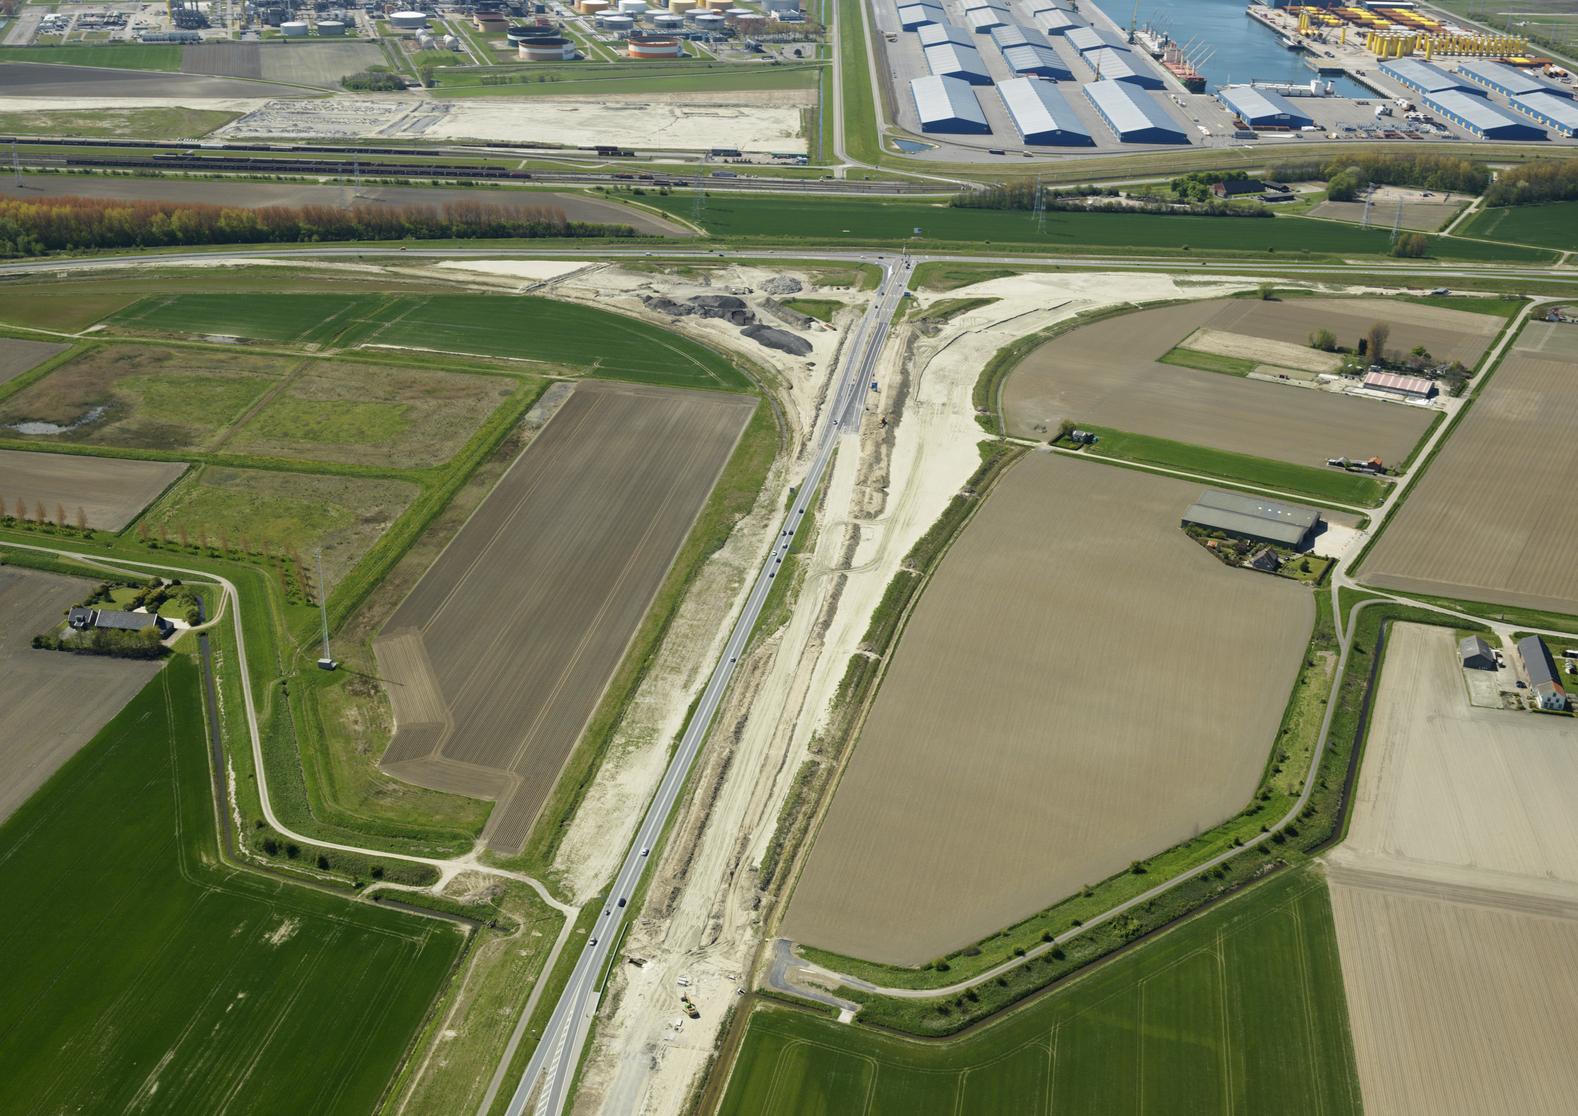 Sloeweg: luchtfoto aansluiting Sloeweg, Westerscheldetunnelweg, Bernahrdweg mei 2016 (Foto: Skypictures/ Boskalis)